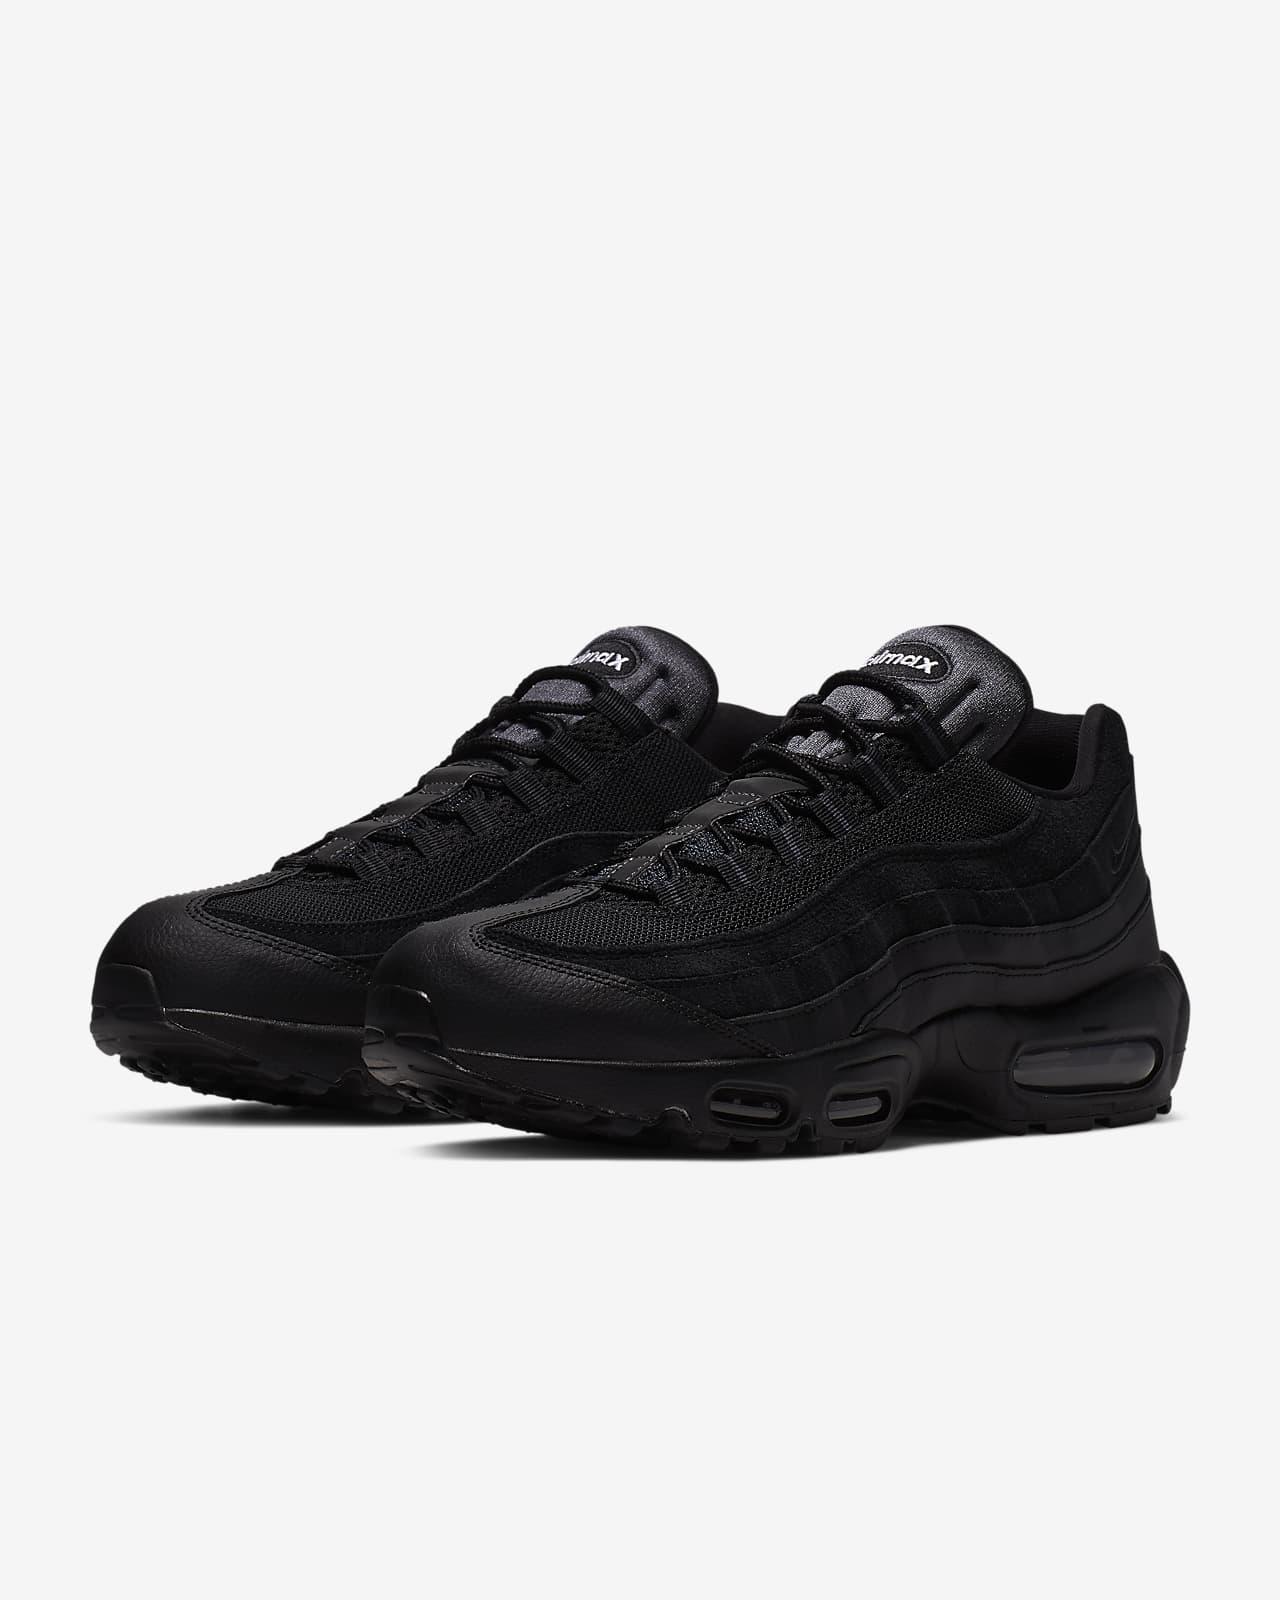 Nike Air Max 95 Essential Unisex Shoe